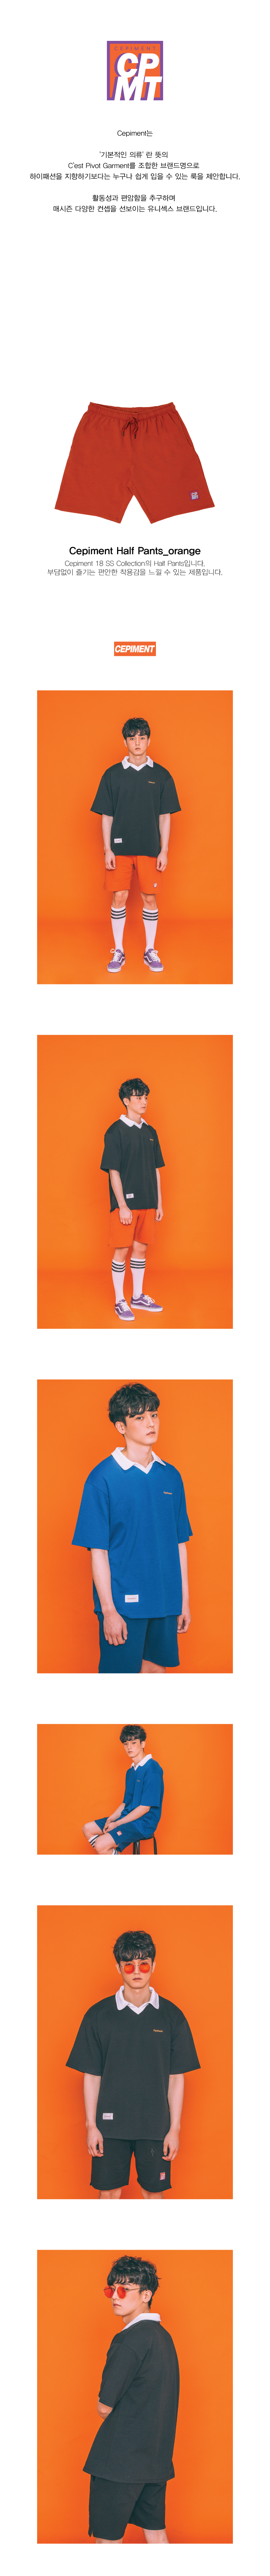 18SS-쭈리반바지-오렌지1.jpg